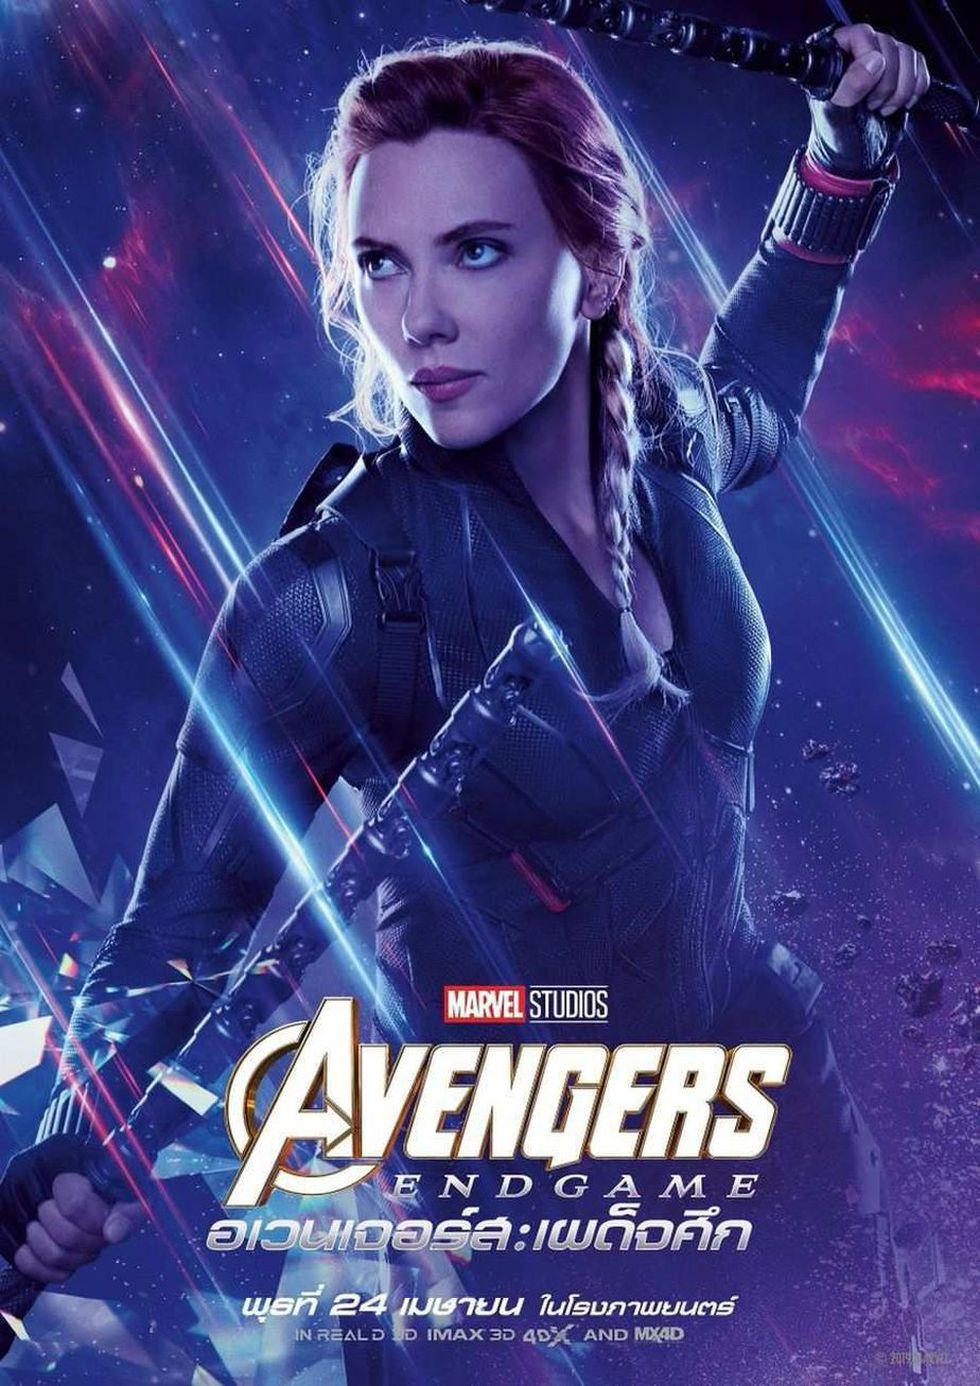 Natasha Romanoff / Black Widow (Foto: Avengers: Endgame / Marvel Studios)